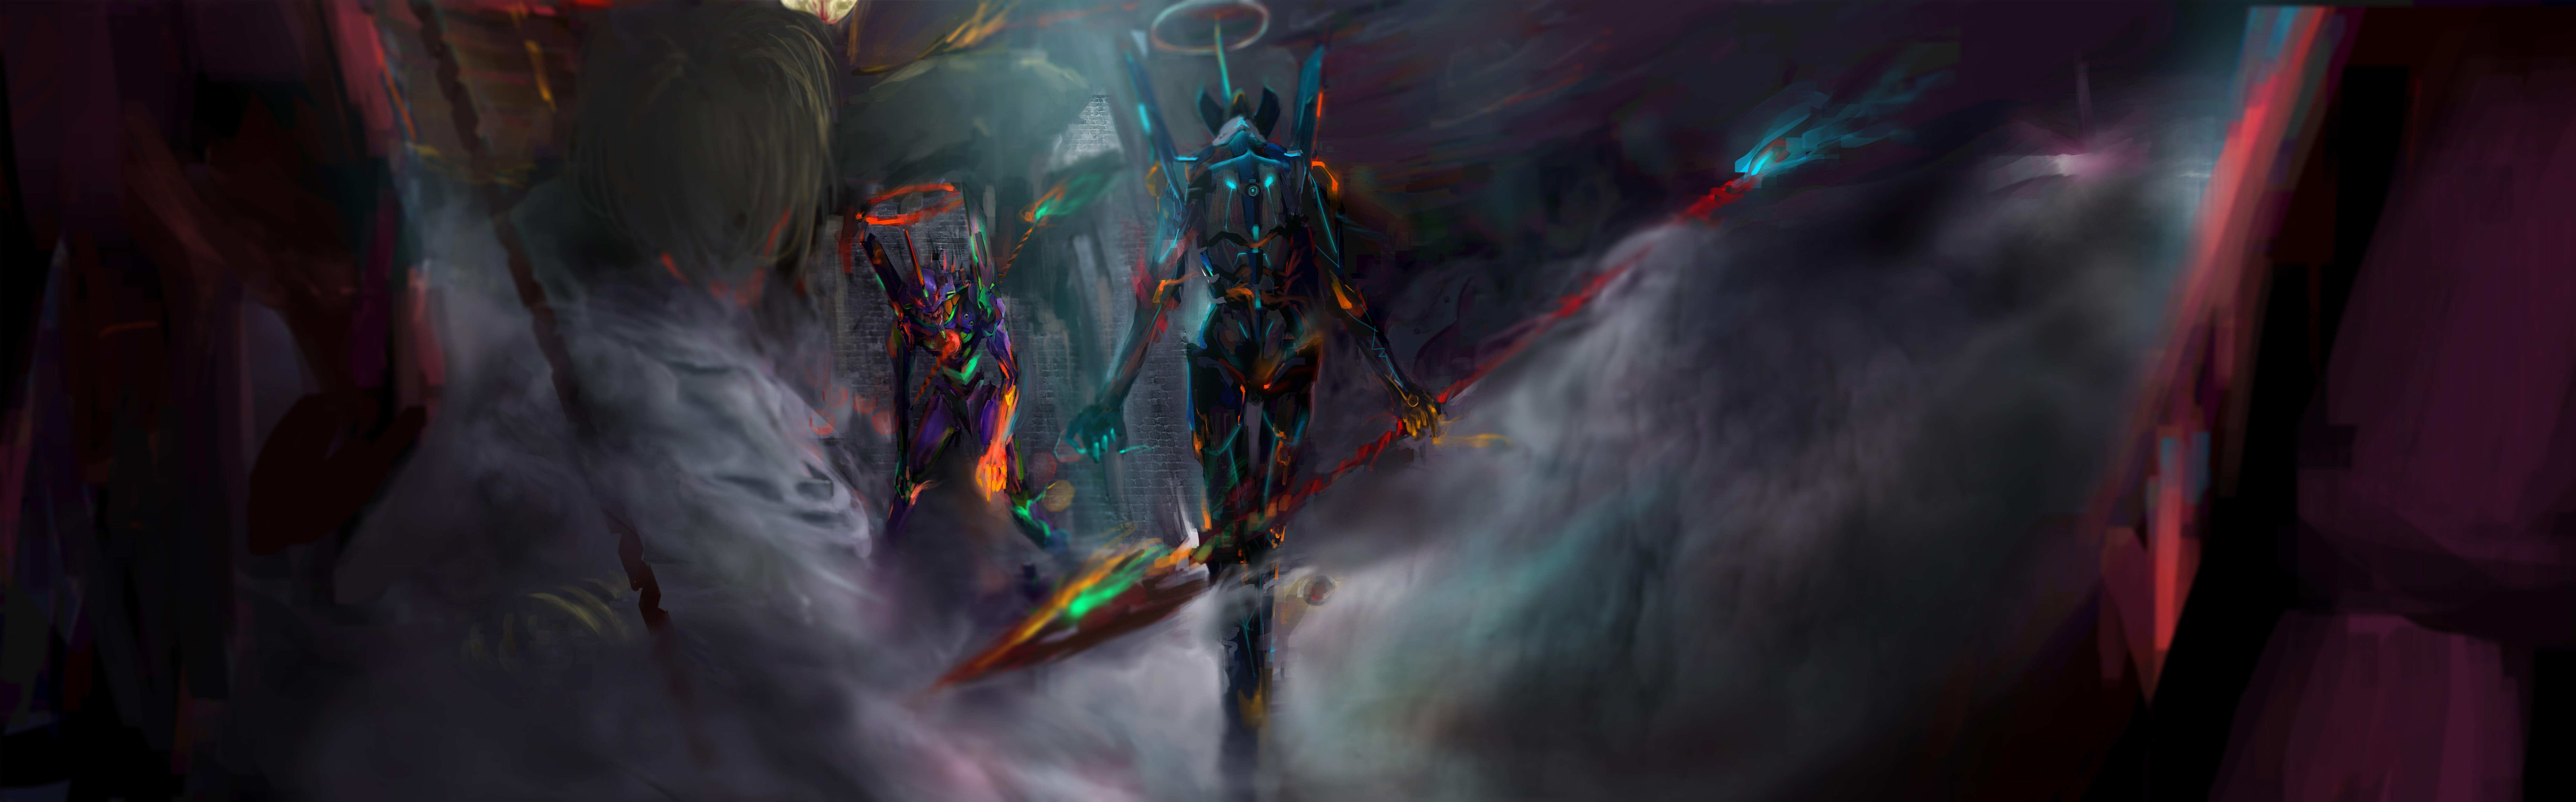 neon genesis evangelion anime hd 4k 5k 8k 10k 12k